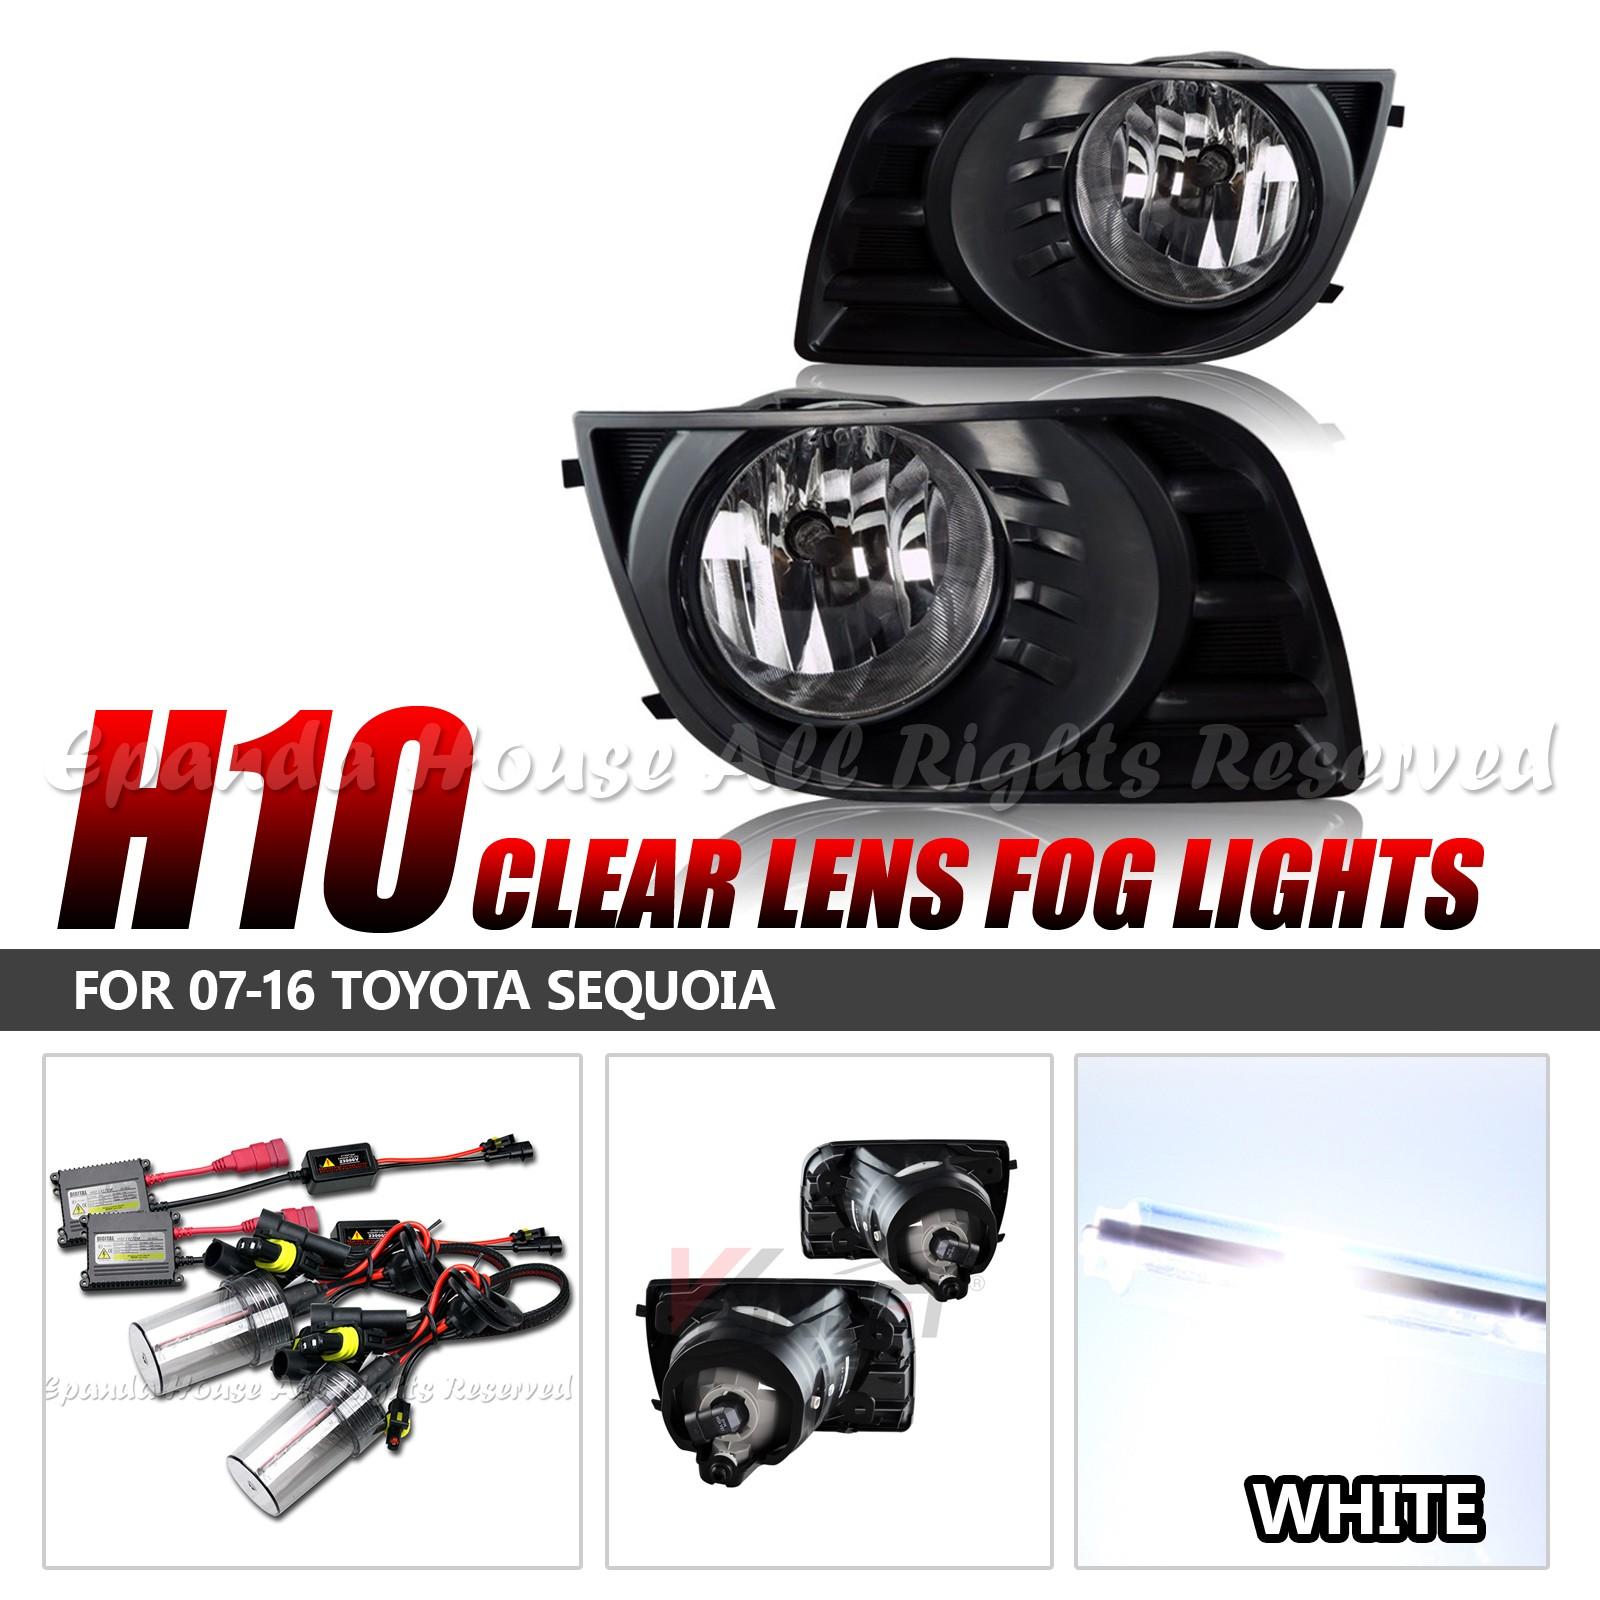 For-07-16-Toyota-Sequoia-Lentes-Transparentes-Faros-Antiniebla-Asambleas-6000K